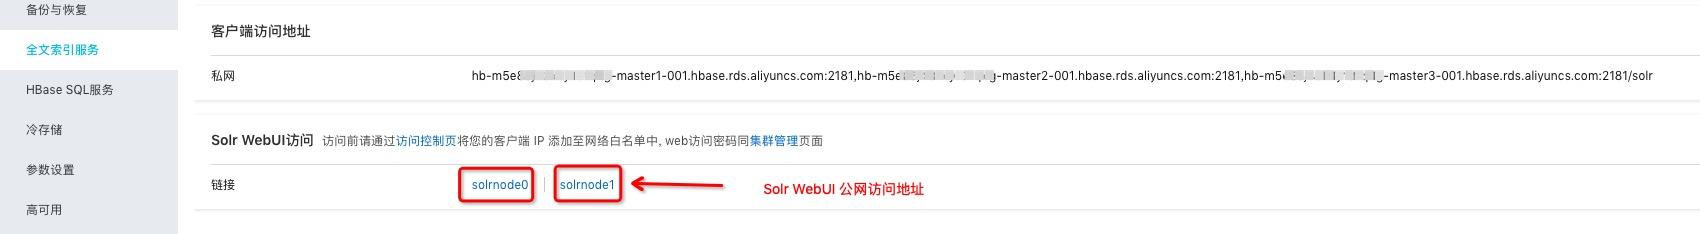 solr webui地址